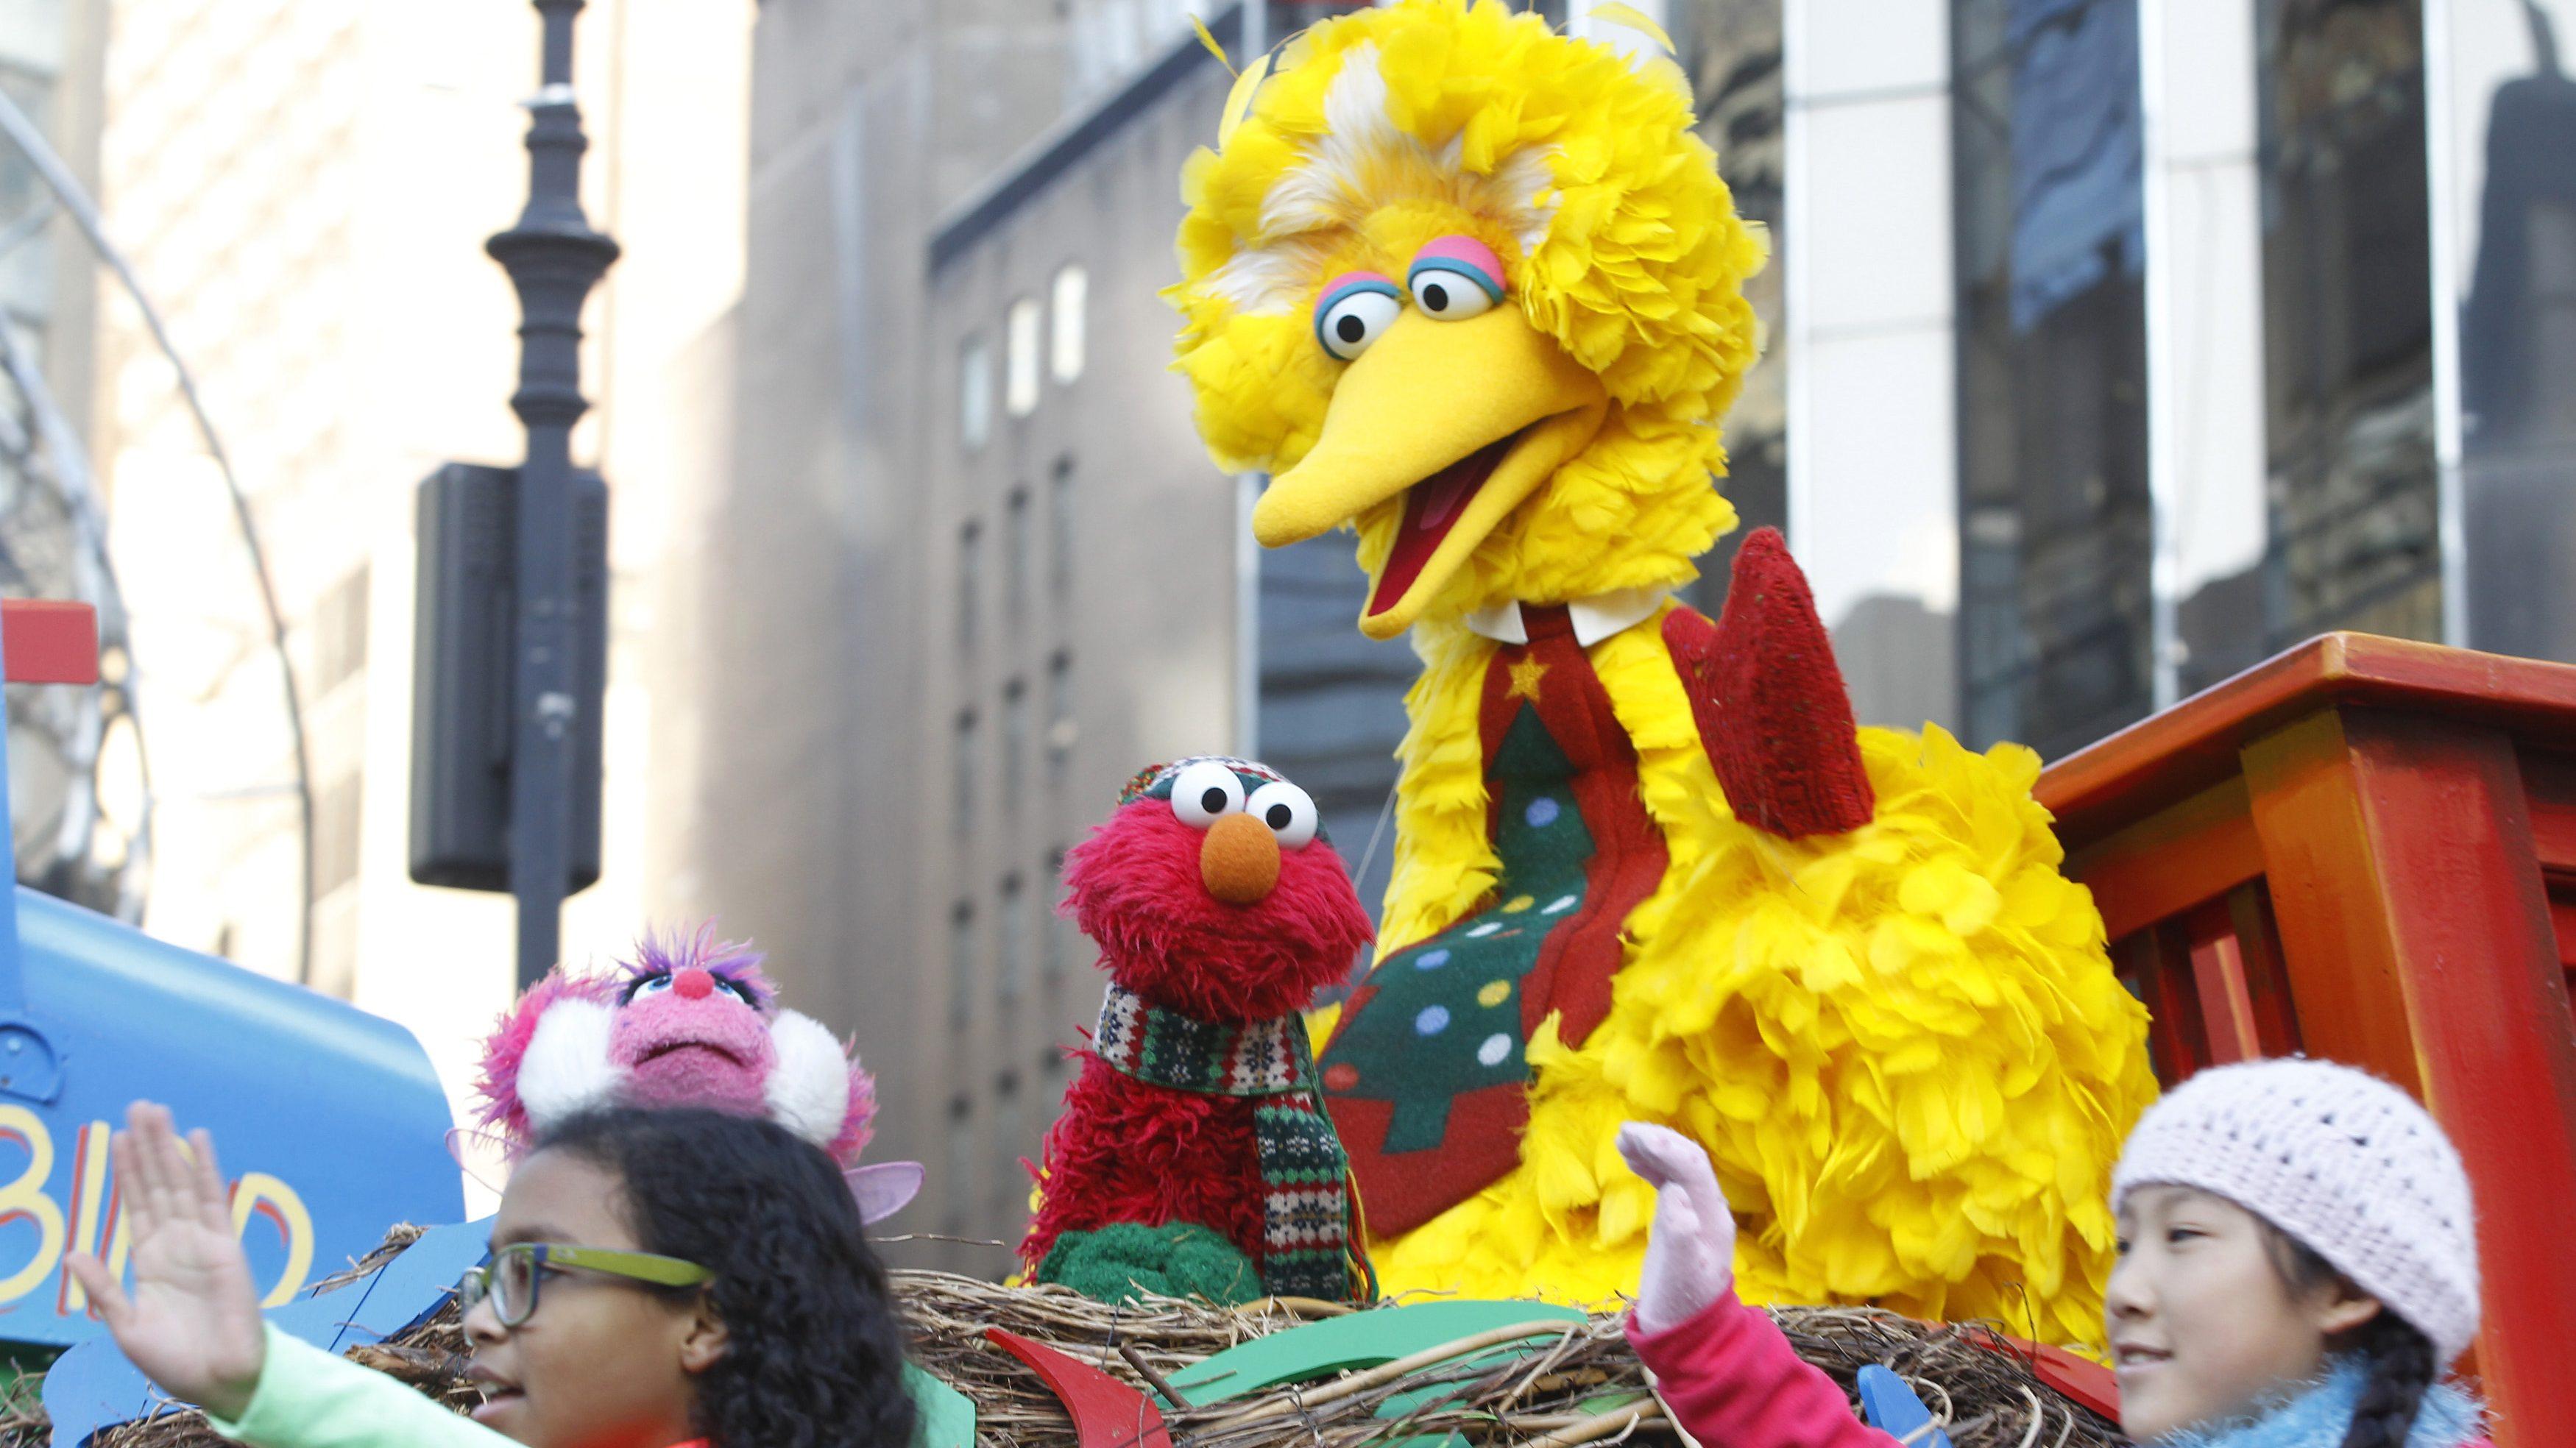 Elmo and Big Bird in the Macys parade